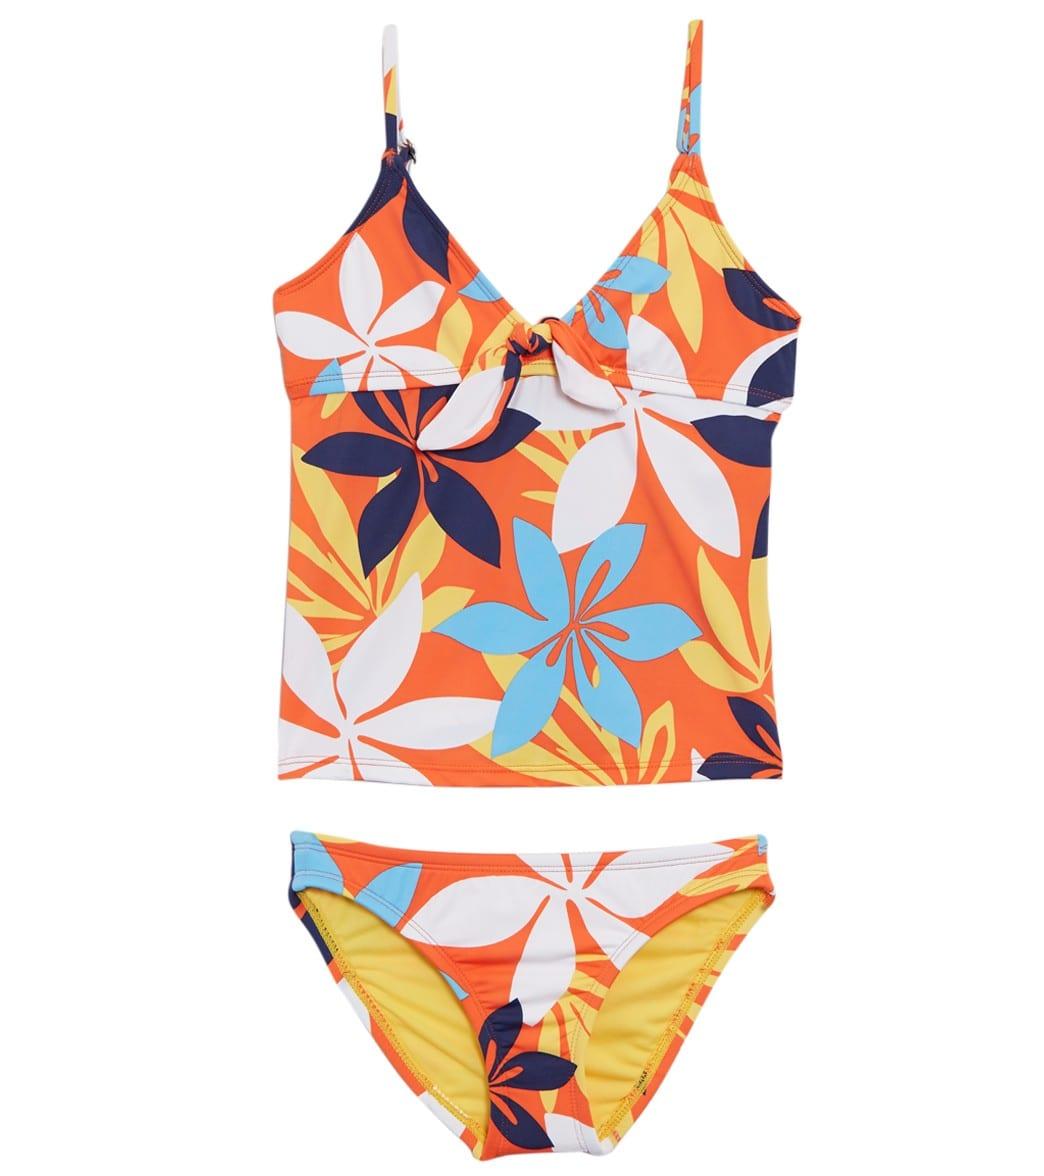 d1d0e4c4d0 Hobie Girls' Bloomy Daze Two Piece Bikini Set (Little Kid, Big Kid) at  SwimOutlet.com